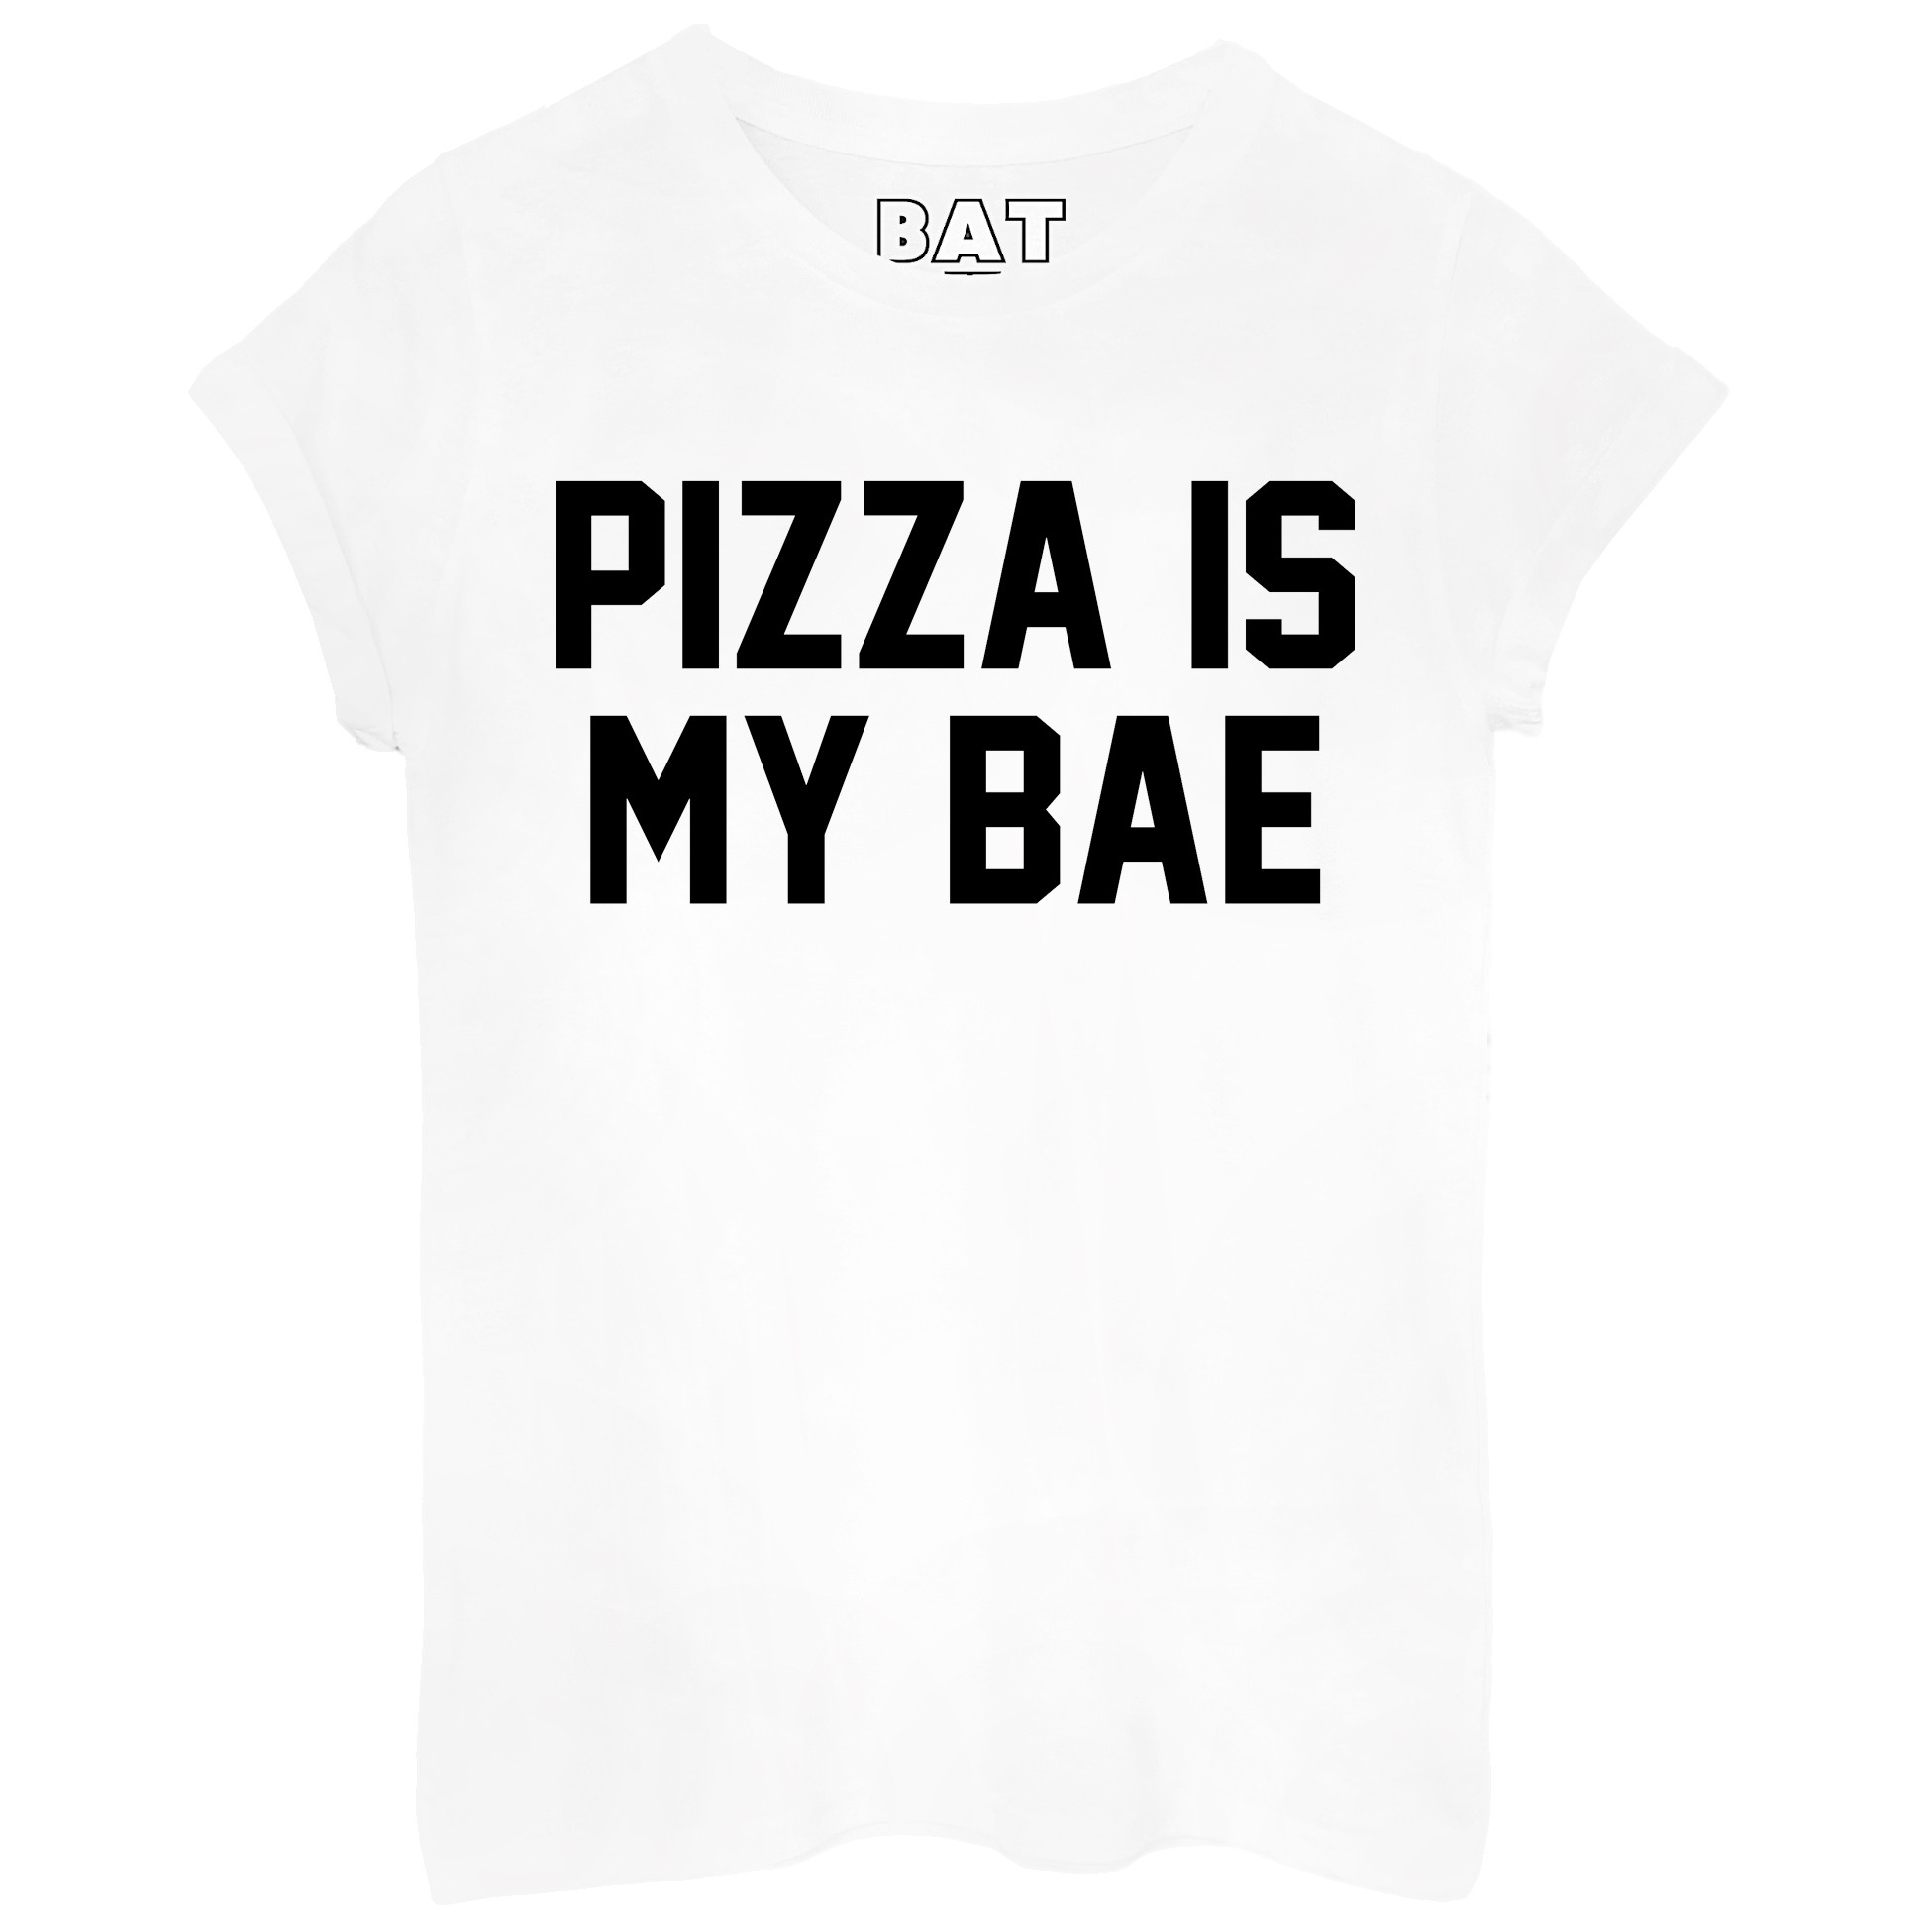 Pizza is my bae tee